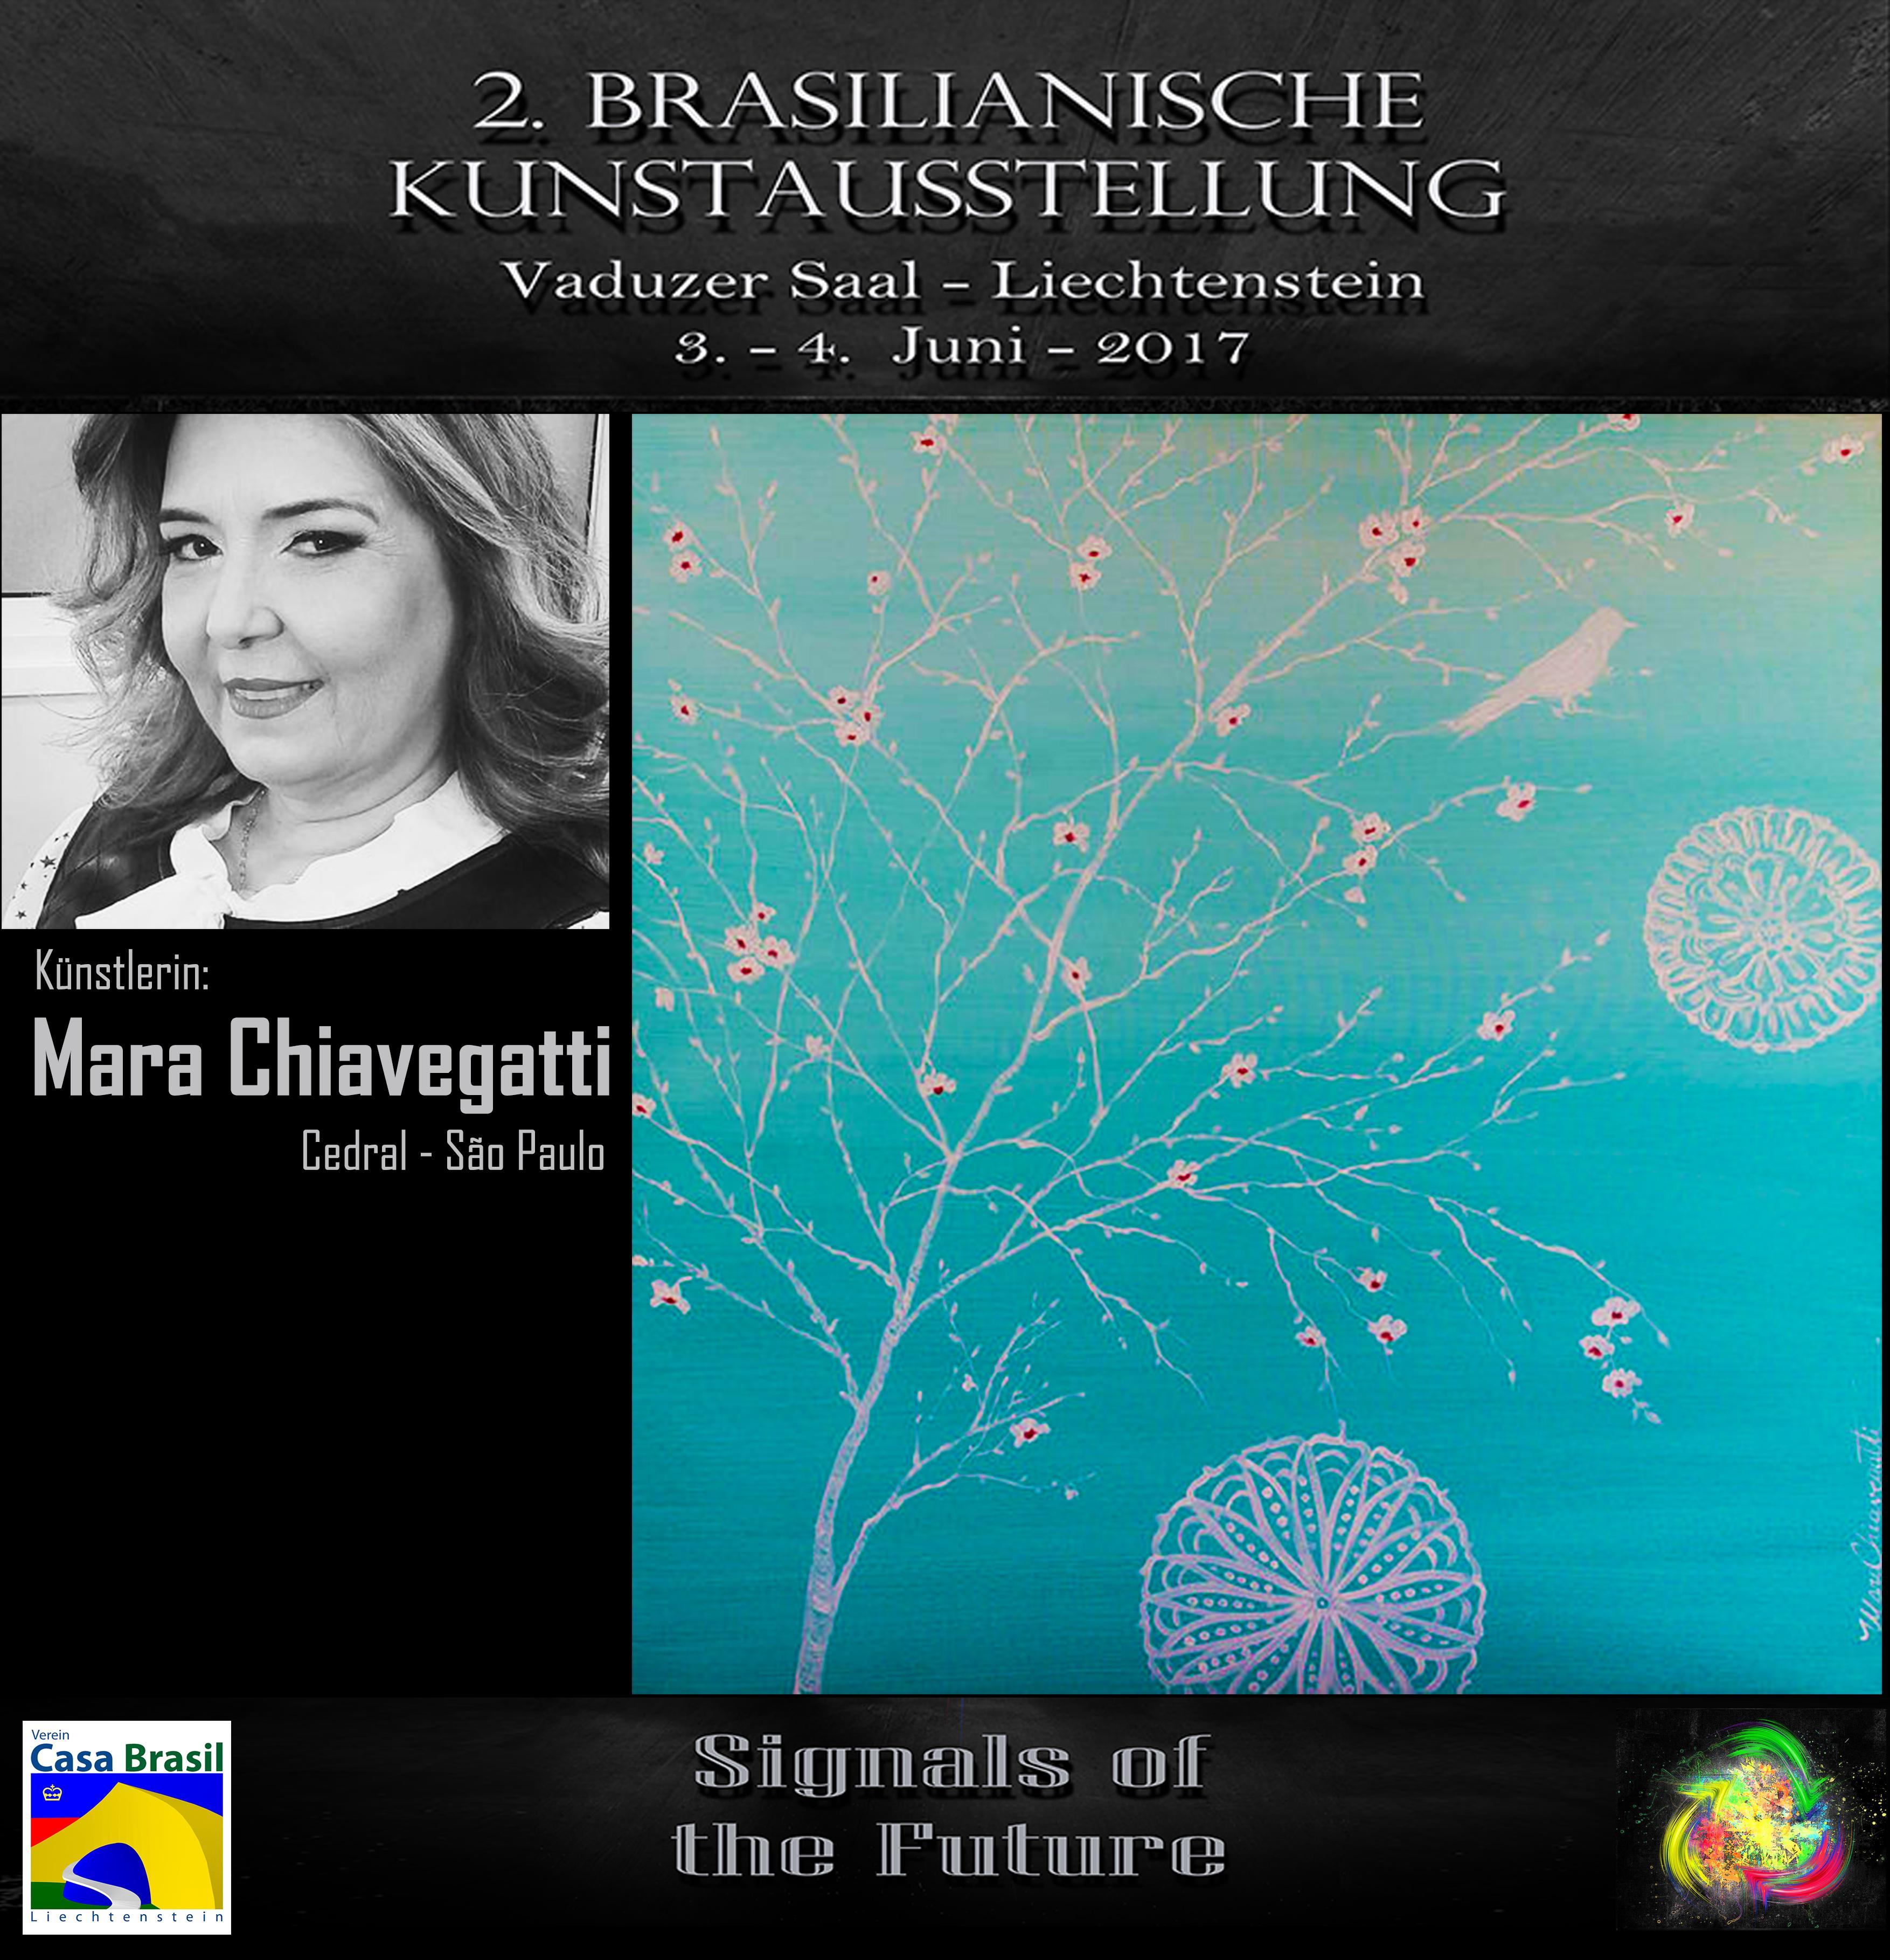 Mara Chiavegatti